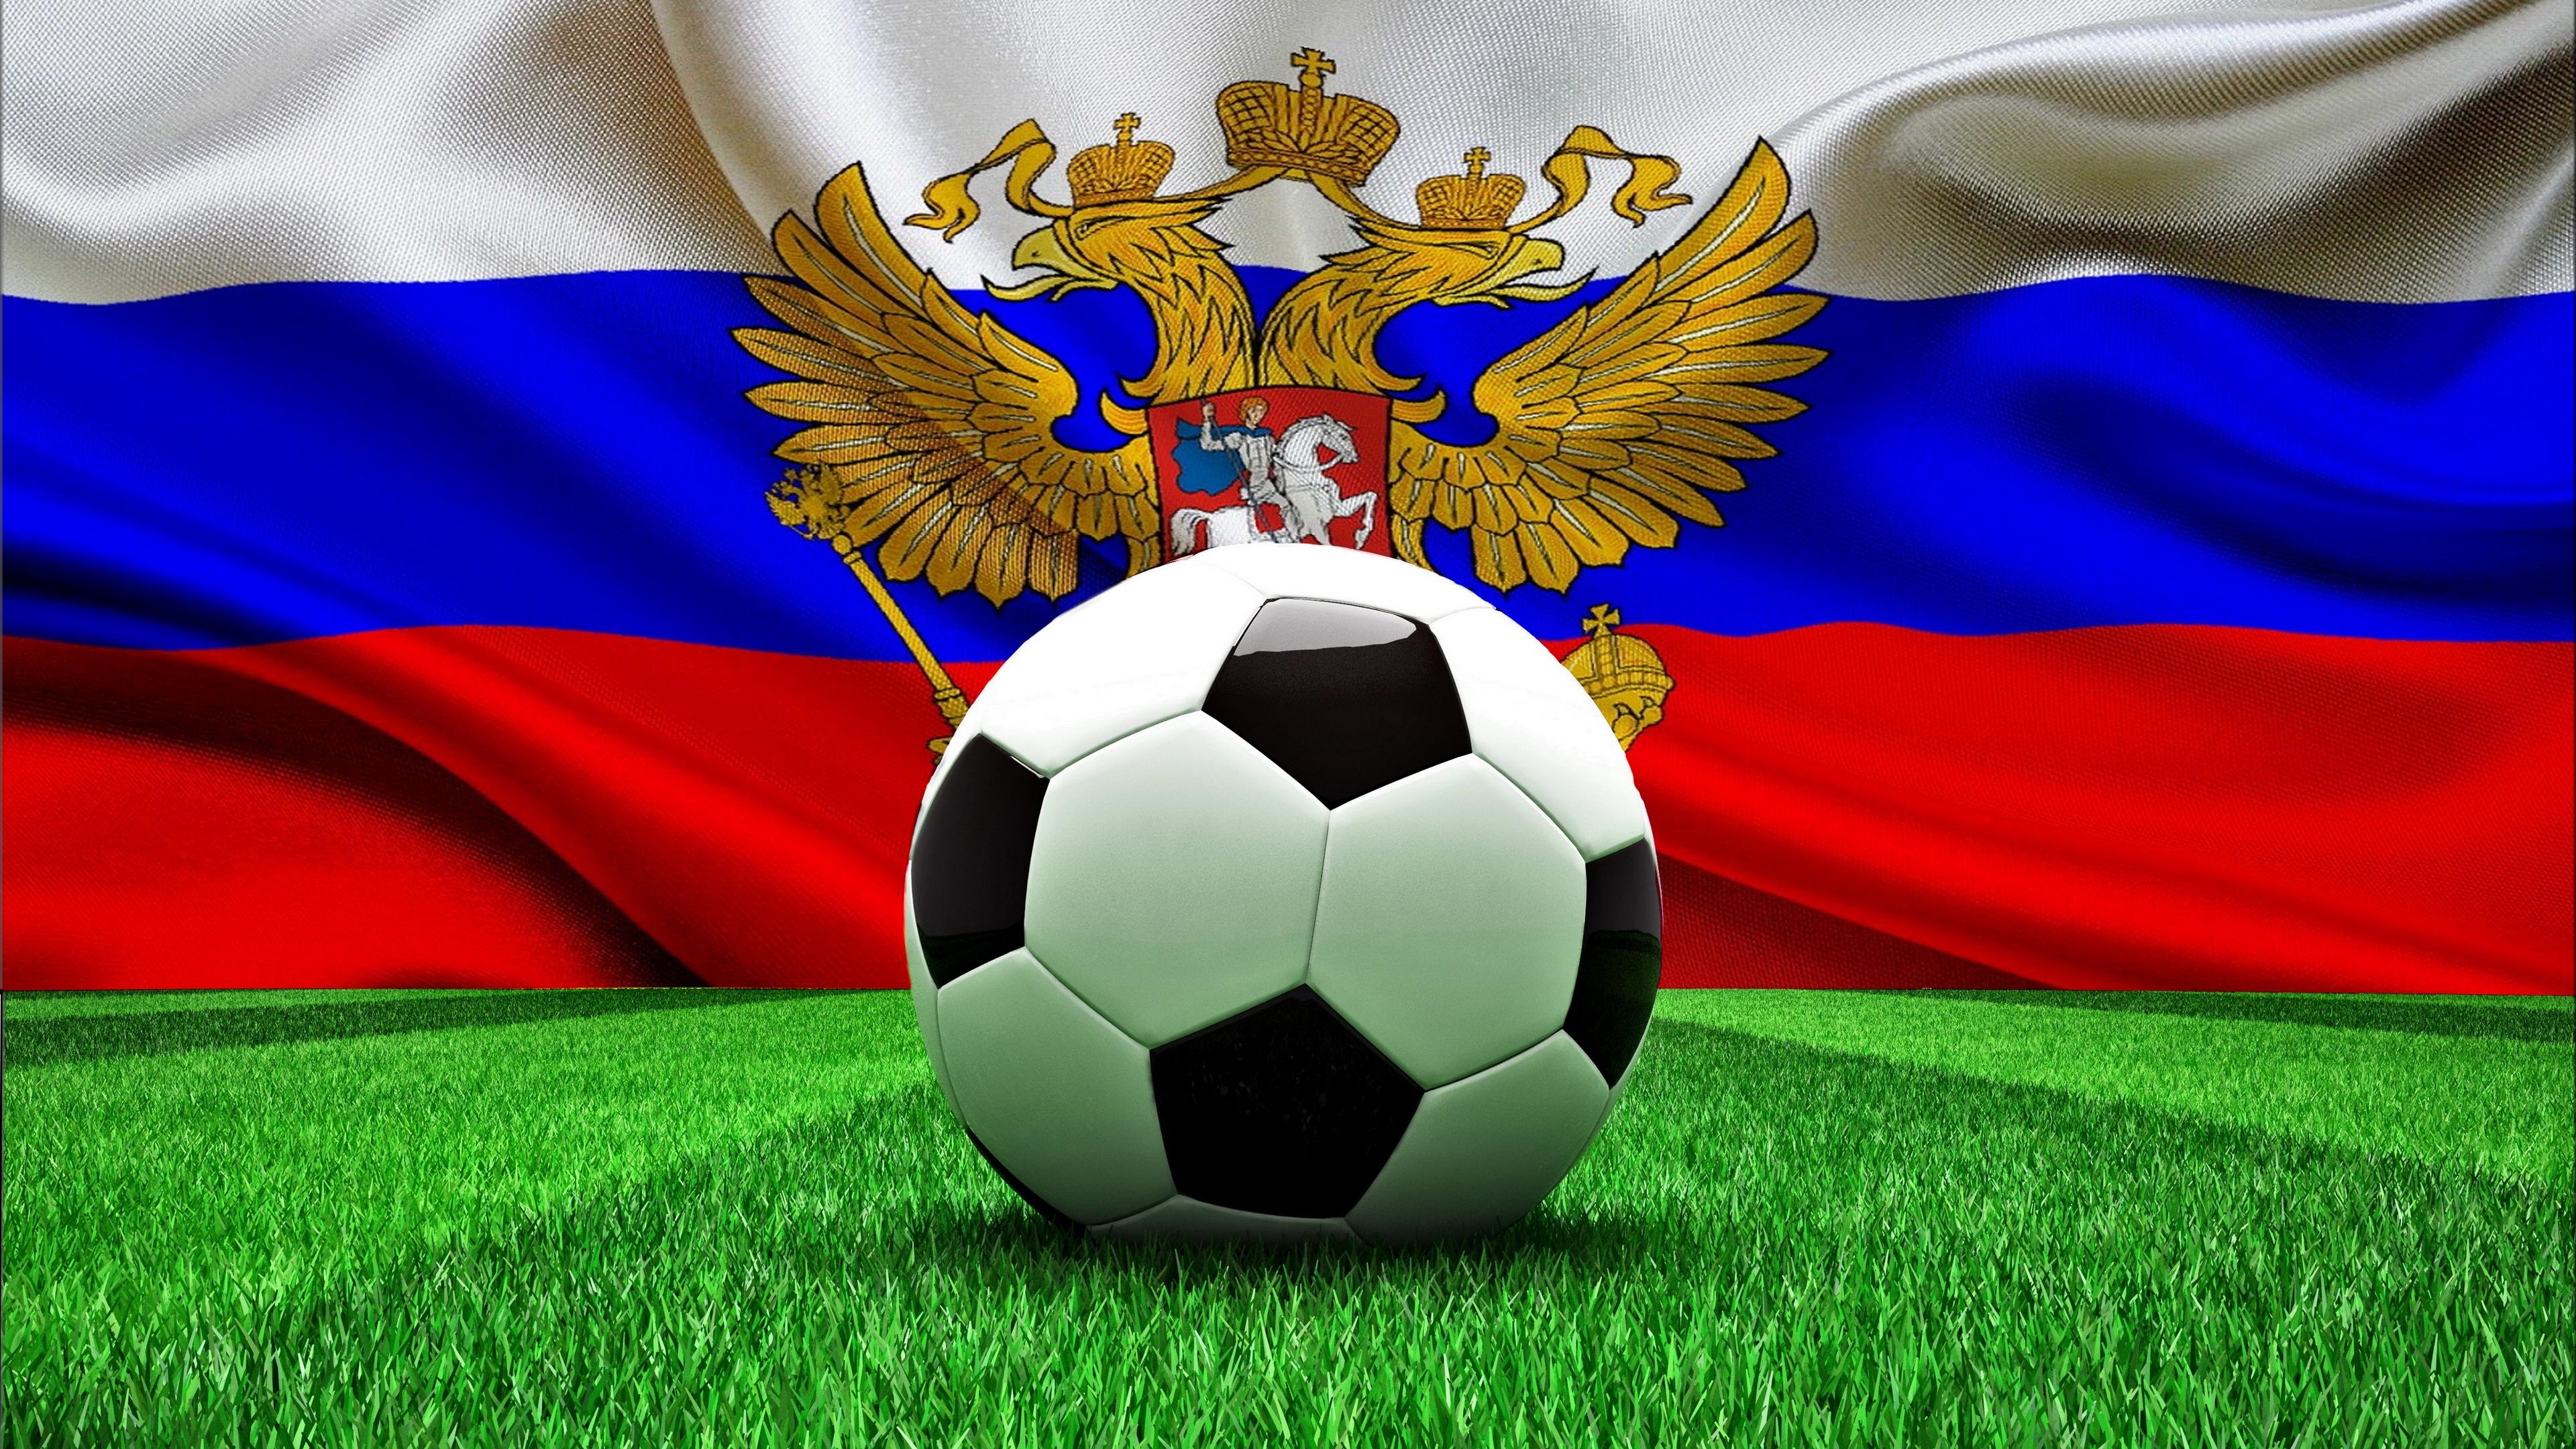 brazil fifa world cup 2014 football 4k 1540062289 - brazil, fifa, world cup, 2014, football 4k - world cup, FIFA, Brazil